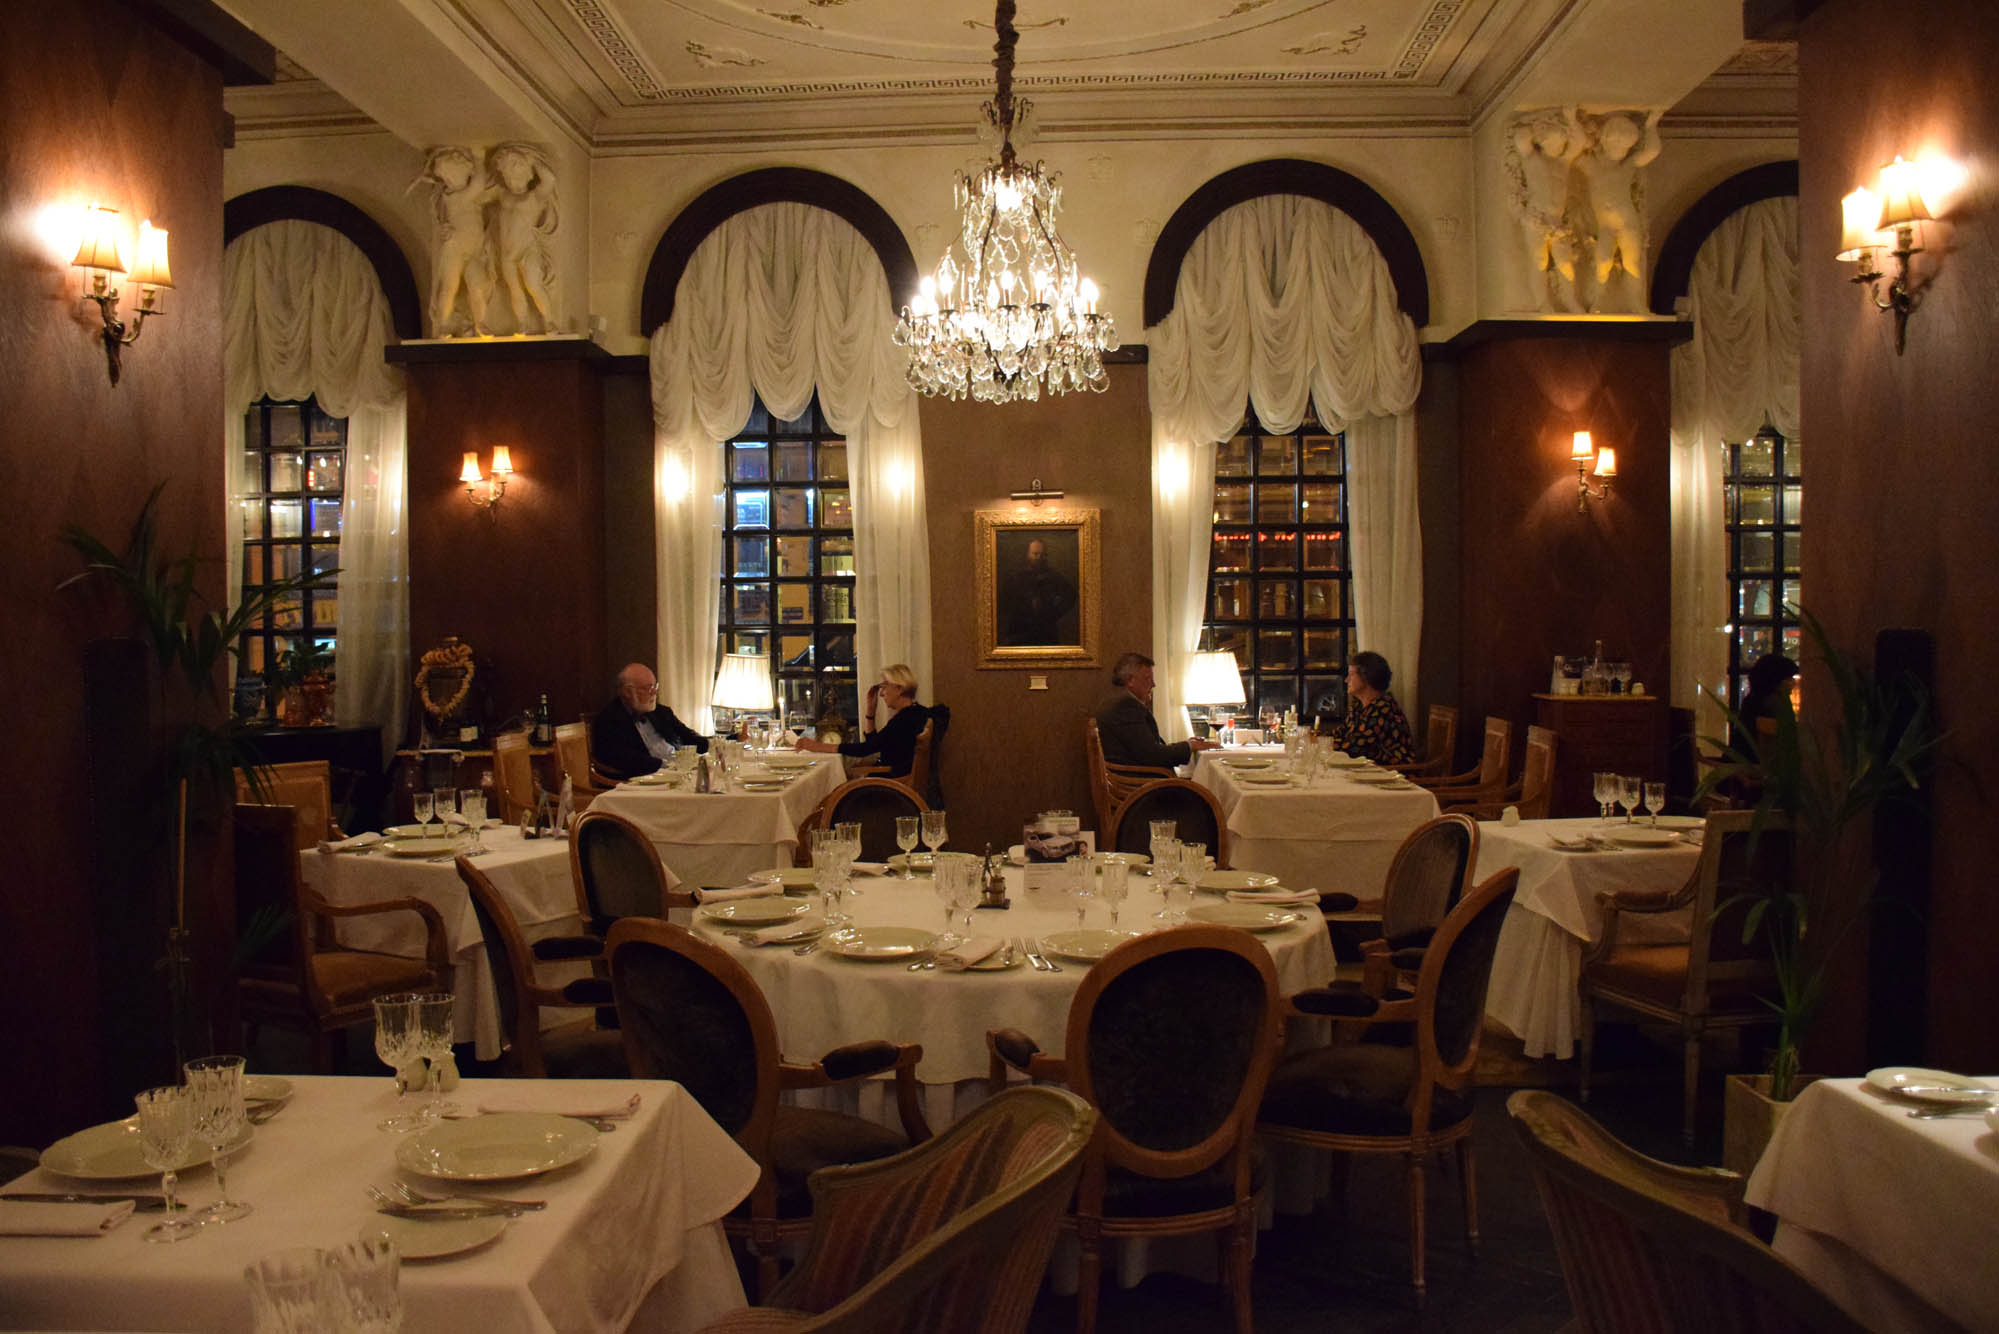 TZAR Restaurant st petersburg russia where to eat 02